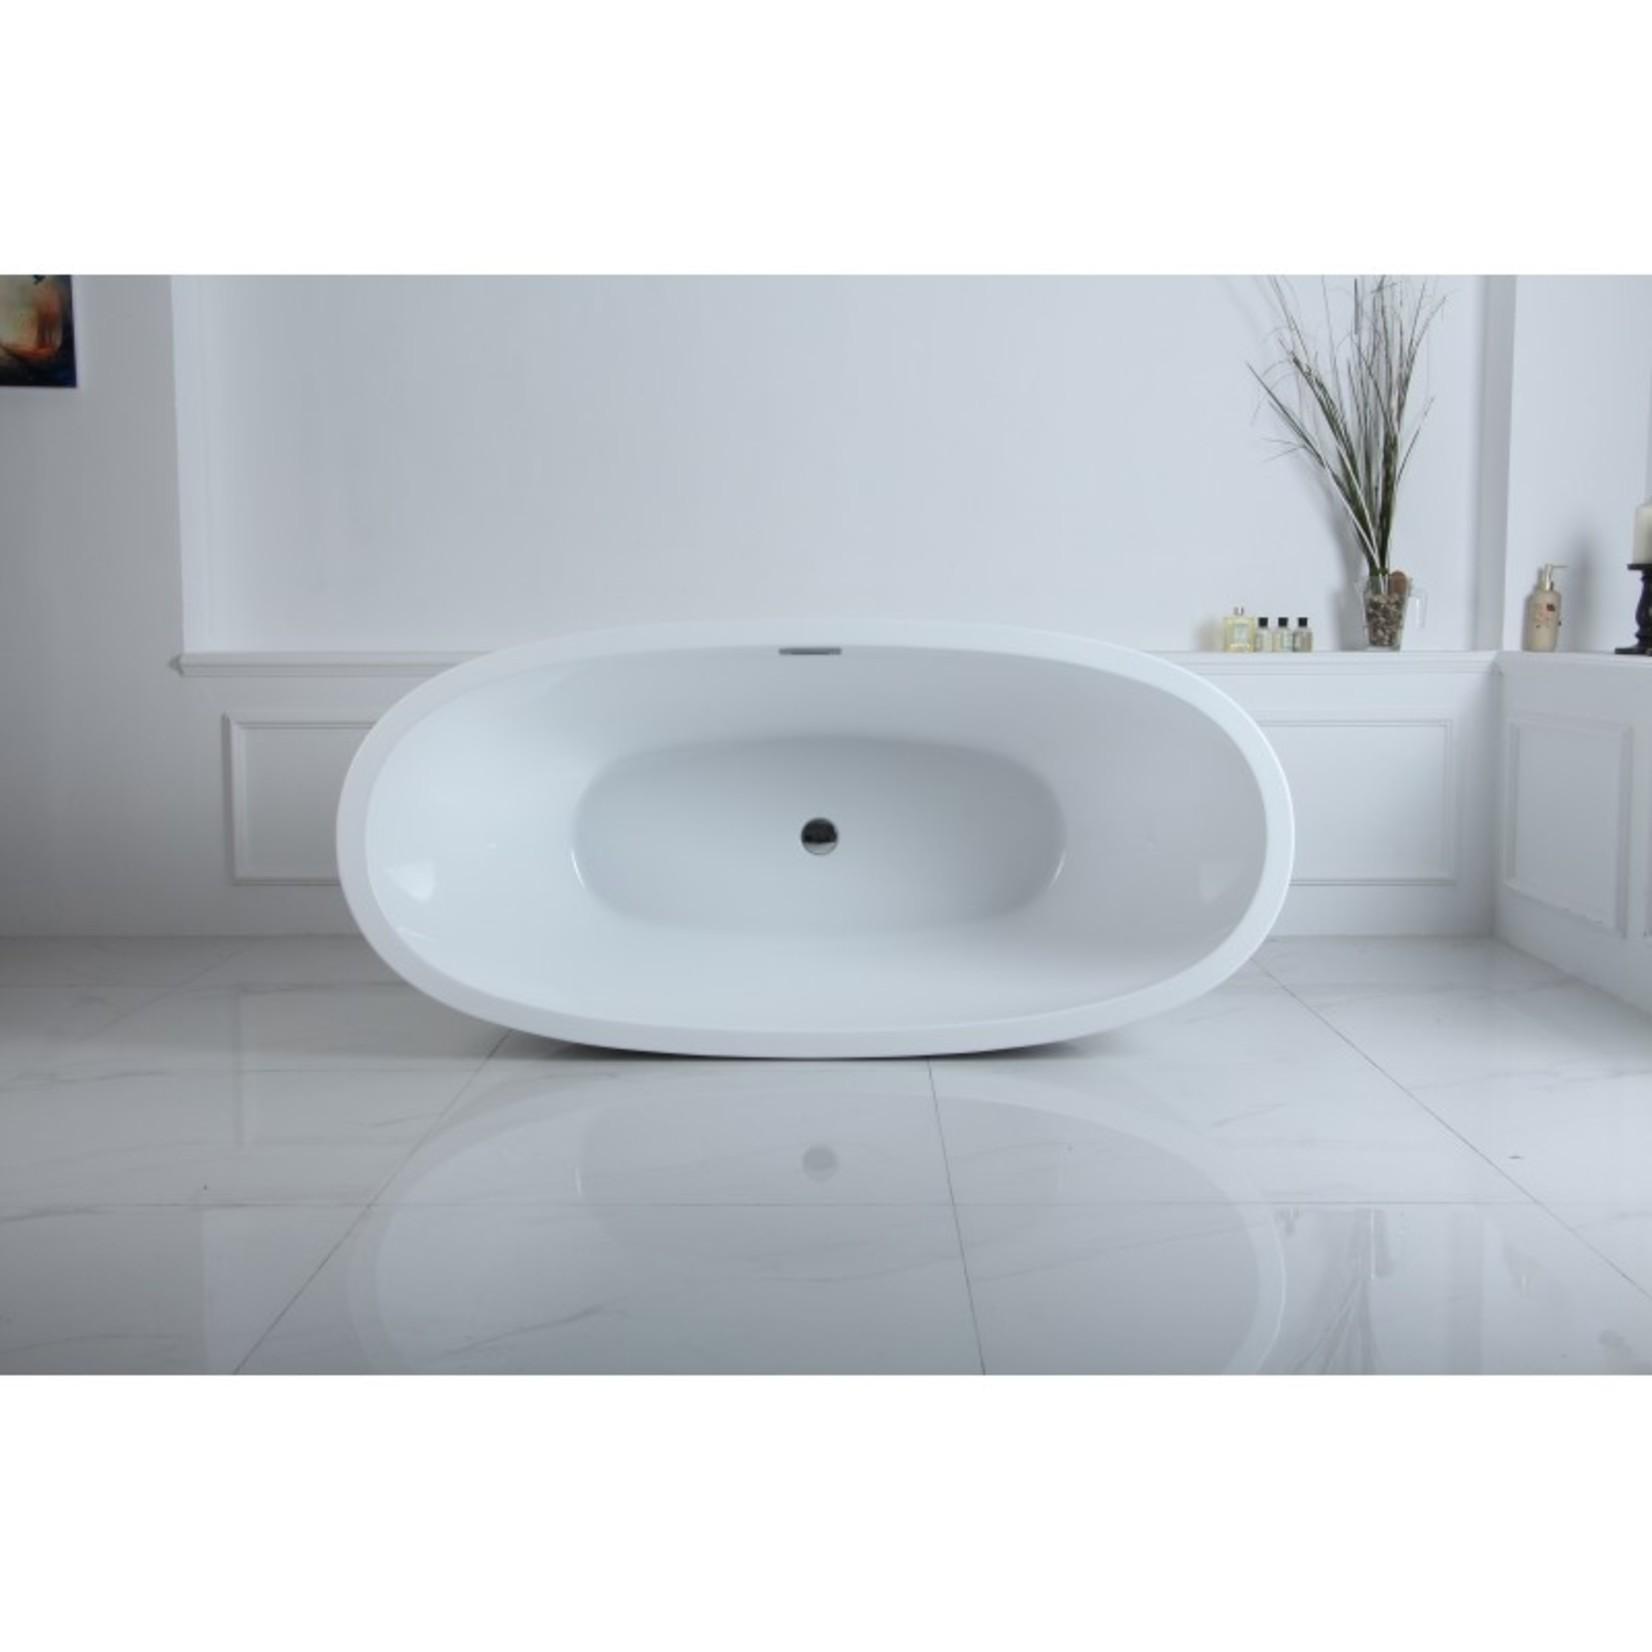 Bain autoportant Amon 67'' blanc DI-02588